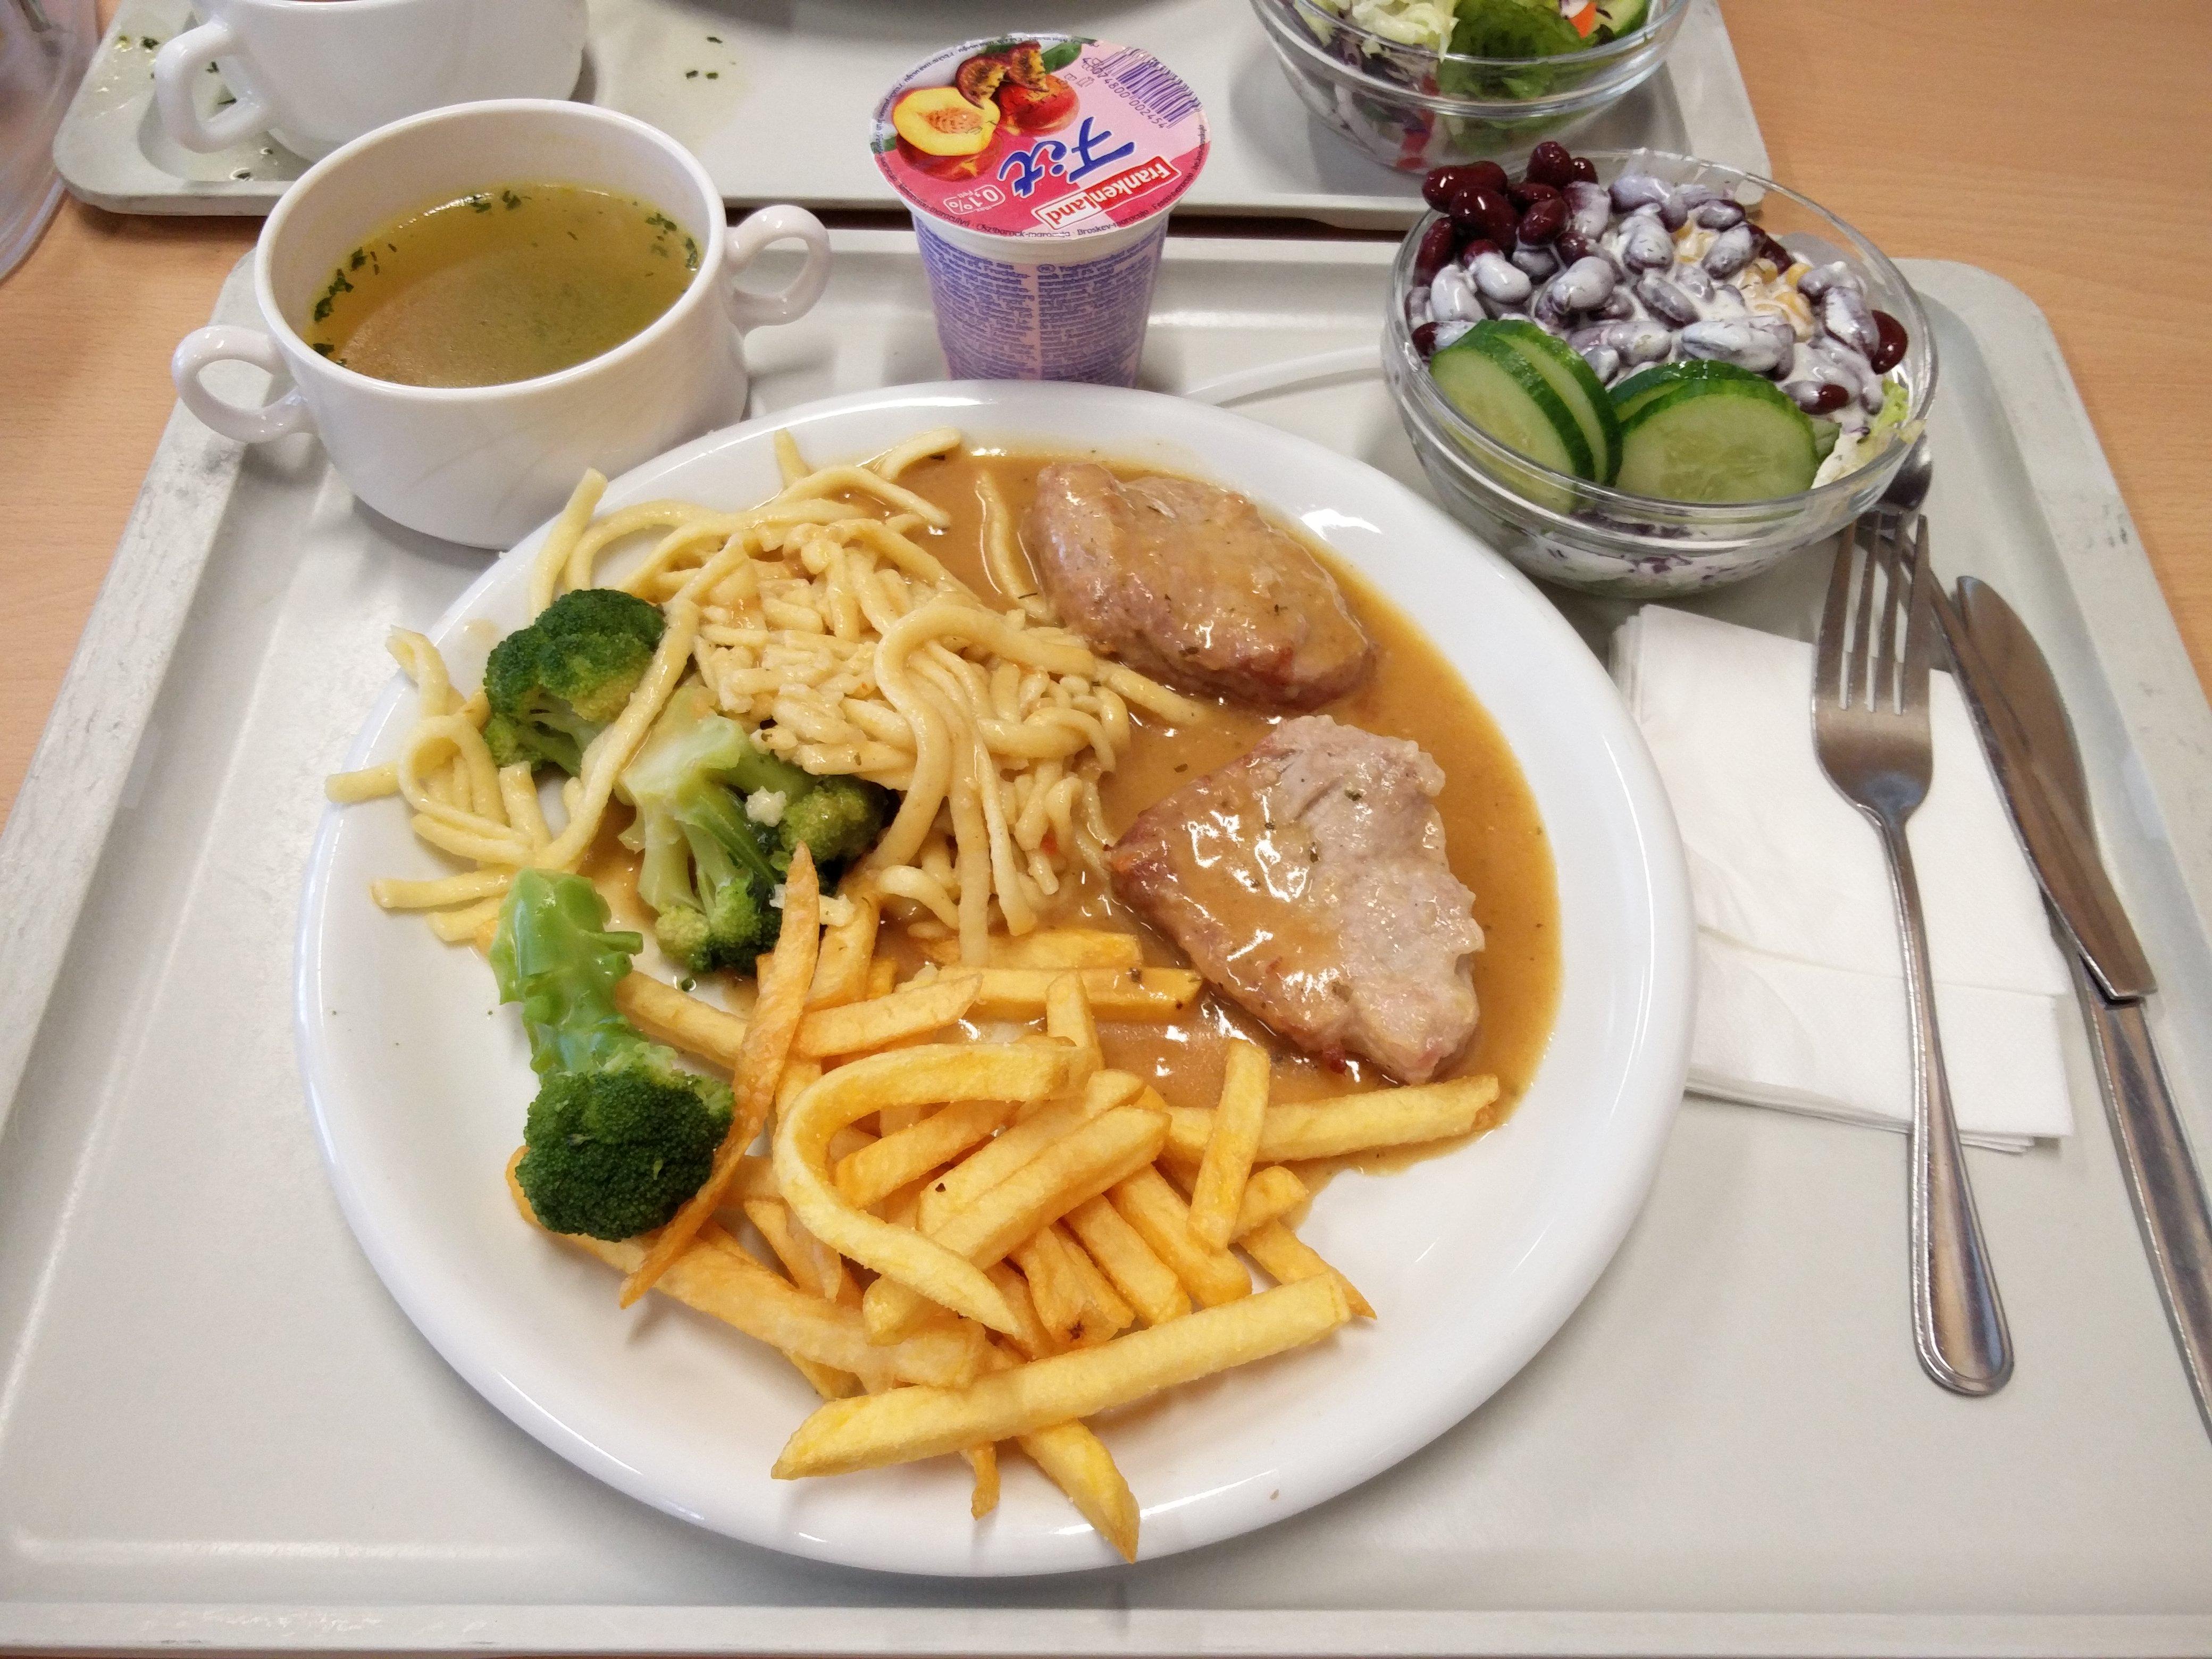 http://foodloader.net/nico_2016-06-23_schweinefilet-spaetzle-pommes-brokkoli-suppe-salat-joghurt.jpg